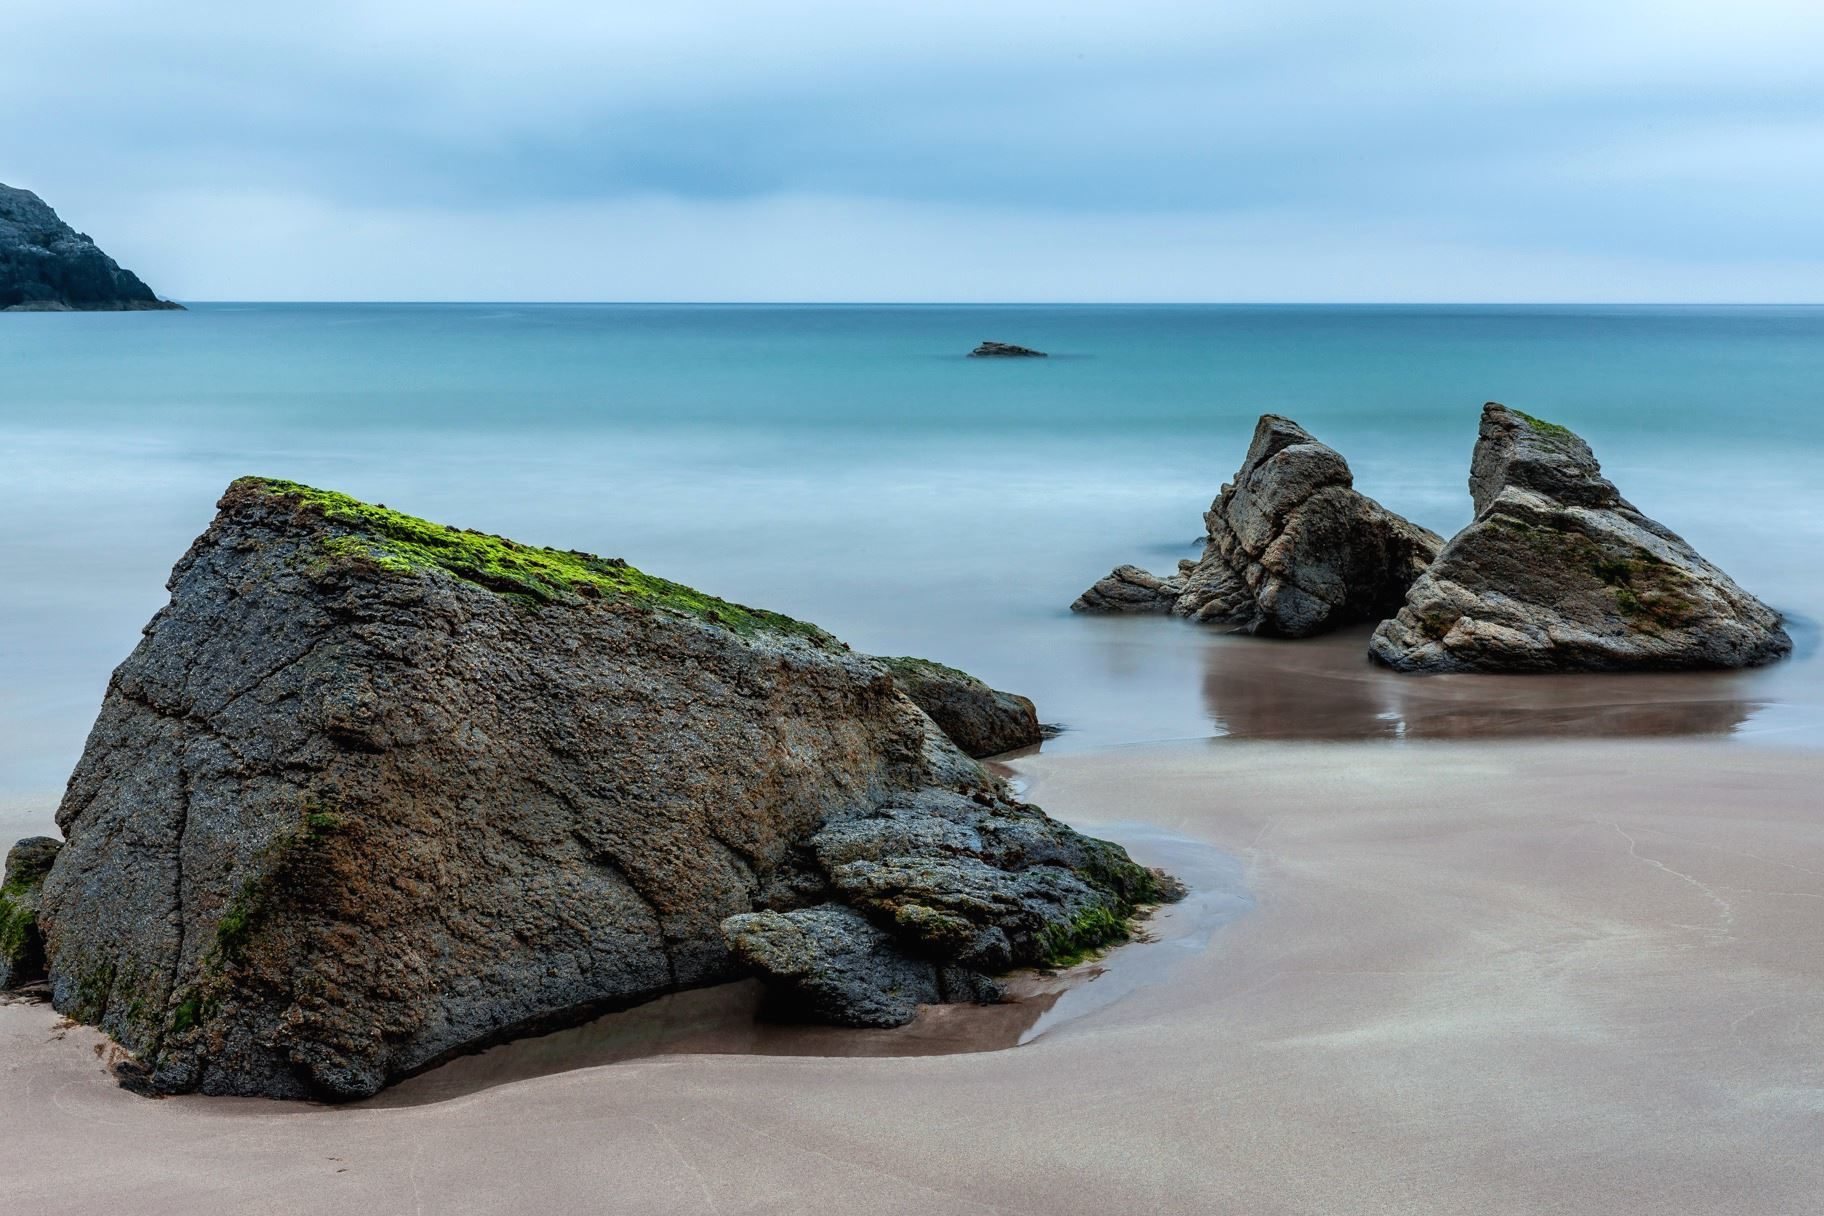 Imagen Gratis: Rocas, Arena, Mar, Playa, Naturaleza, Cielo